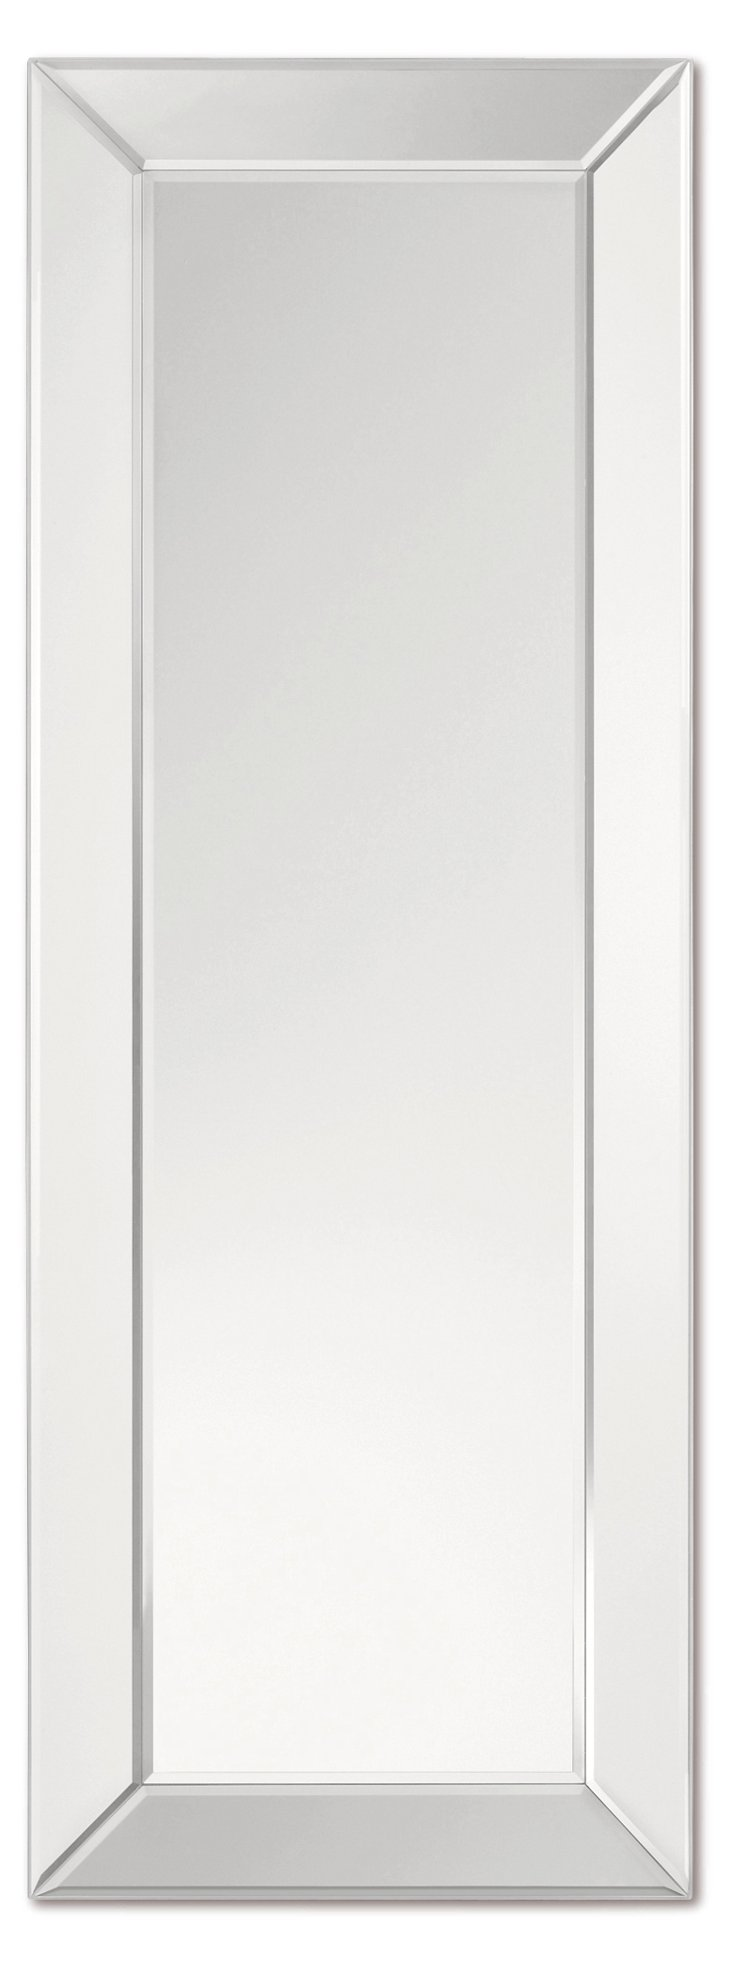 Roosevelt Floor Mirror, Clear